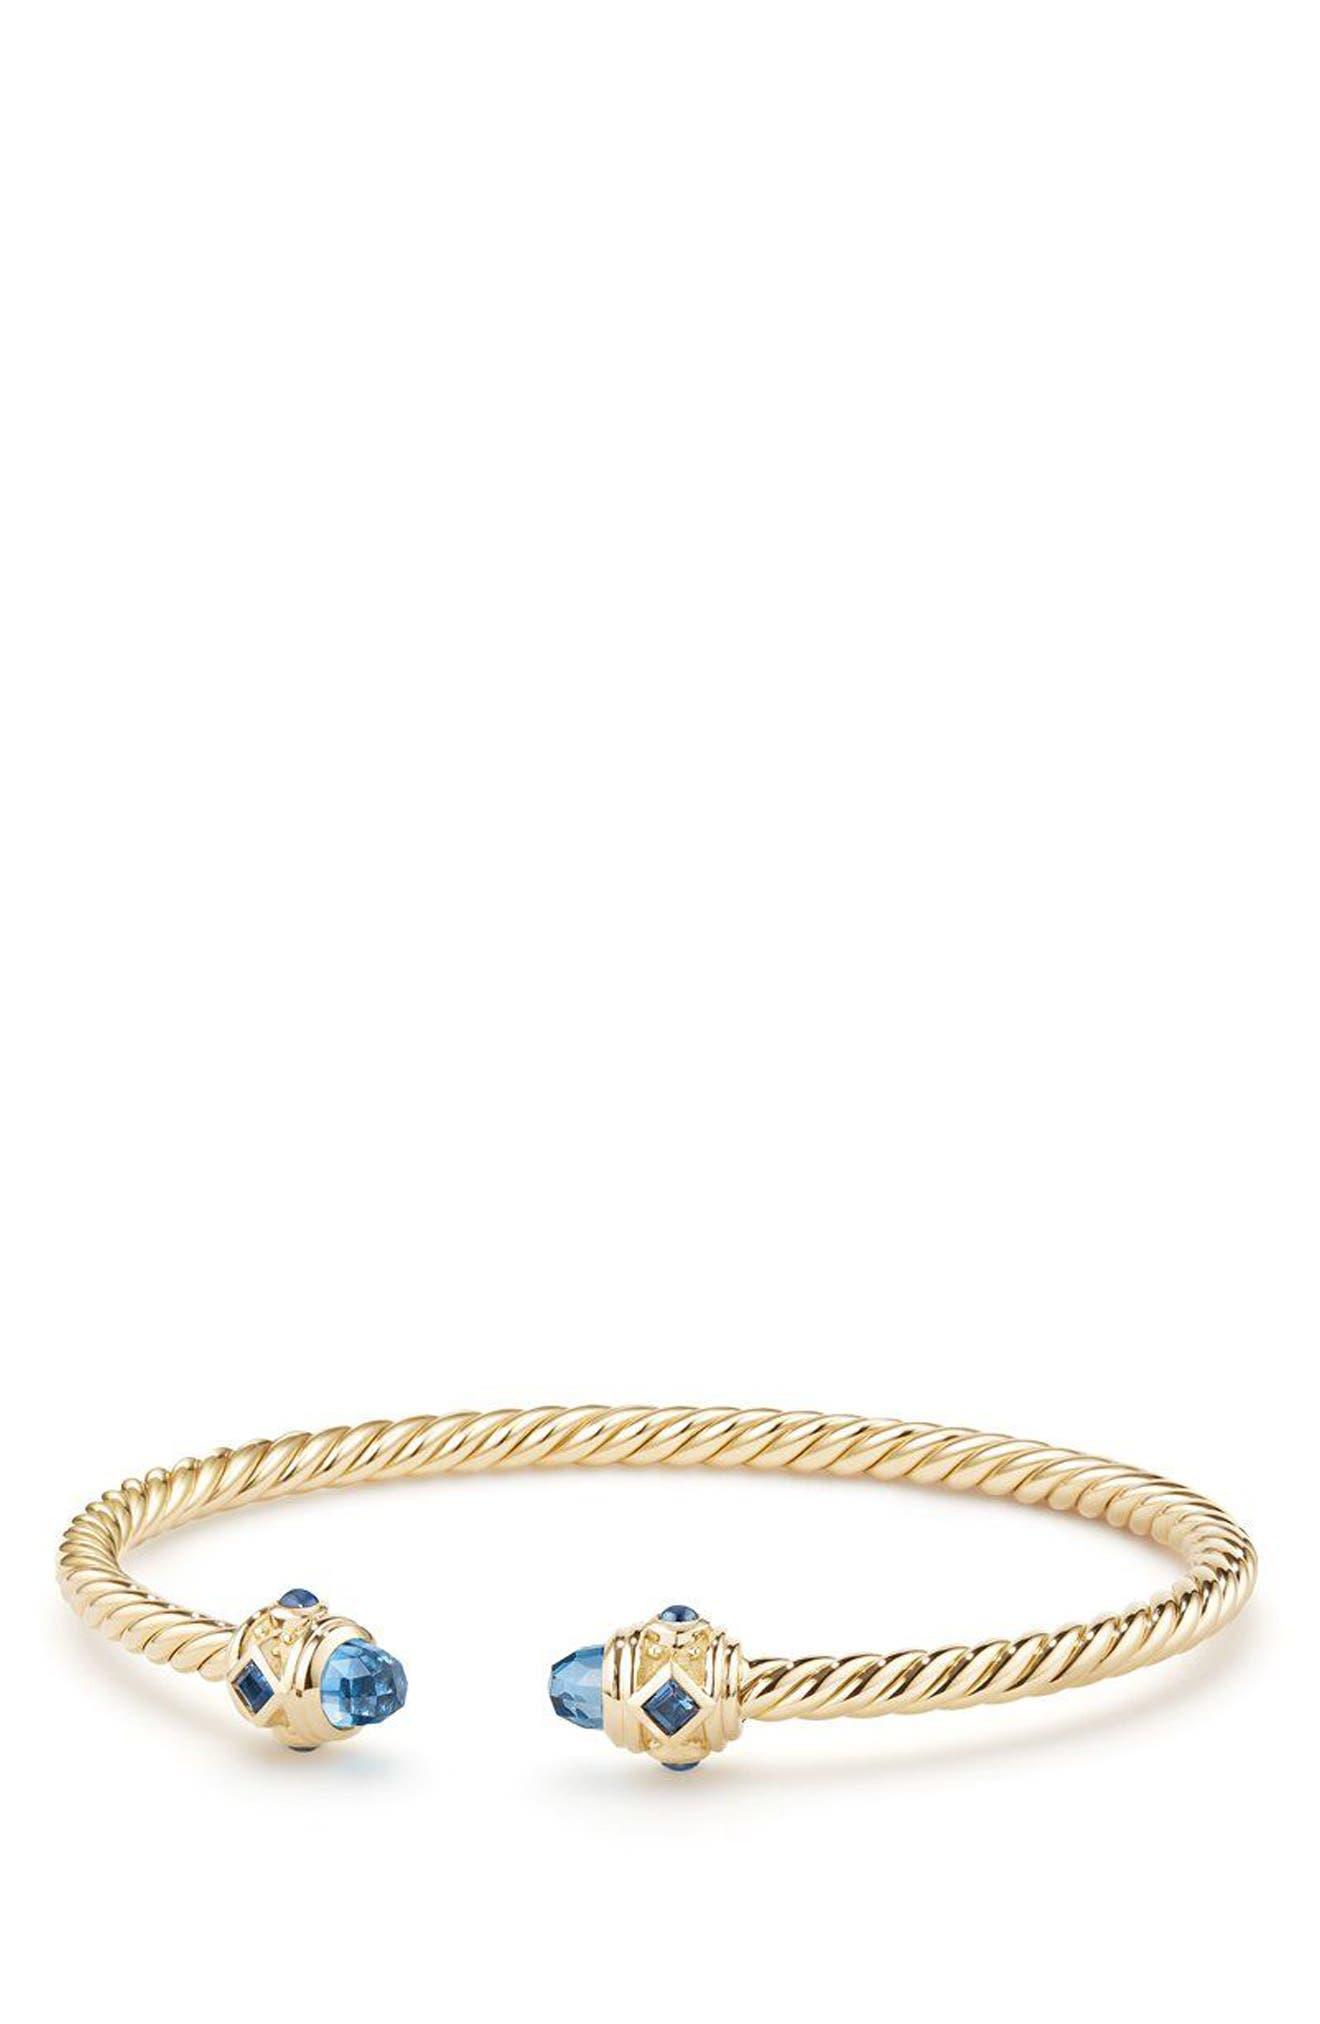 DAVID YURMAN, Renaissance Bracelet in 18K Gold, 3.5mm, Main thumbnail 1, color, GOLD/ HAMPTON BLUE TOPAZ